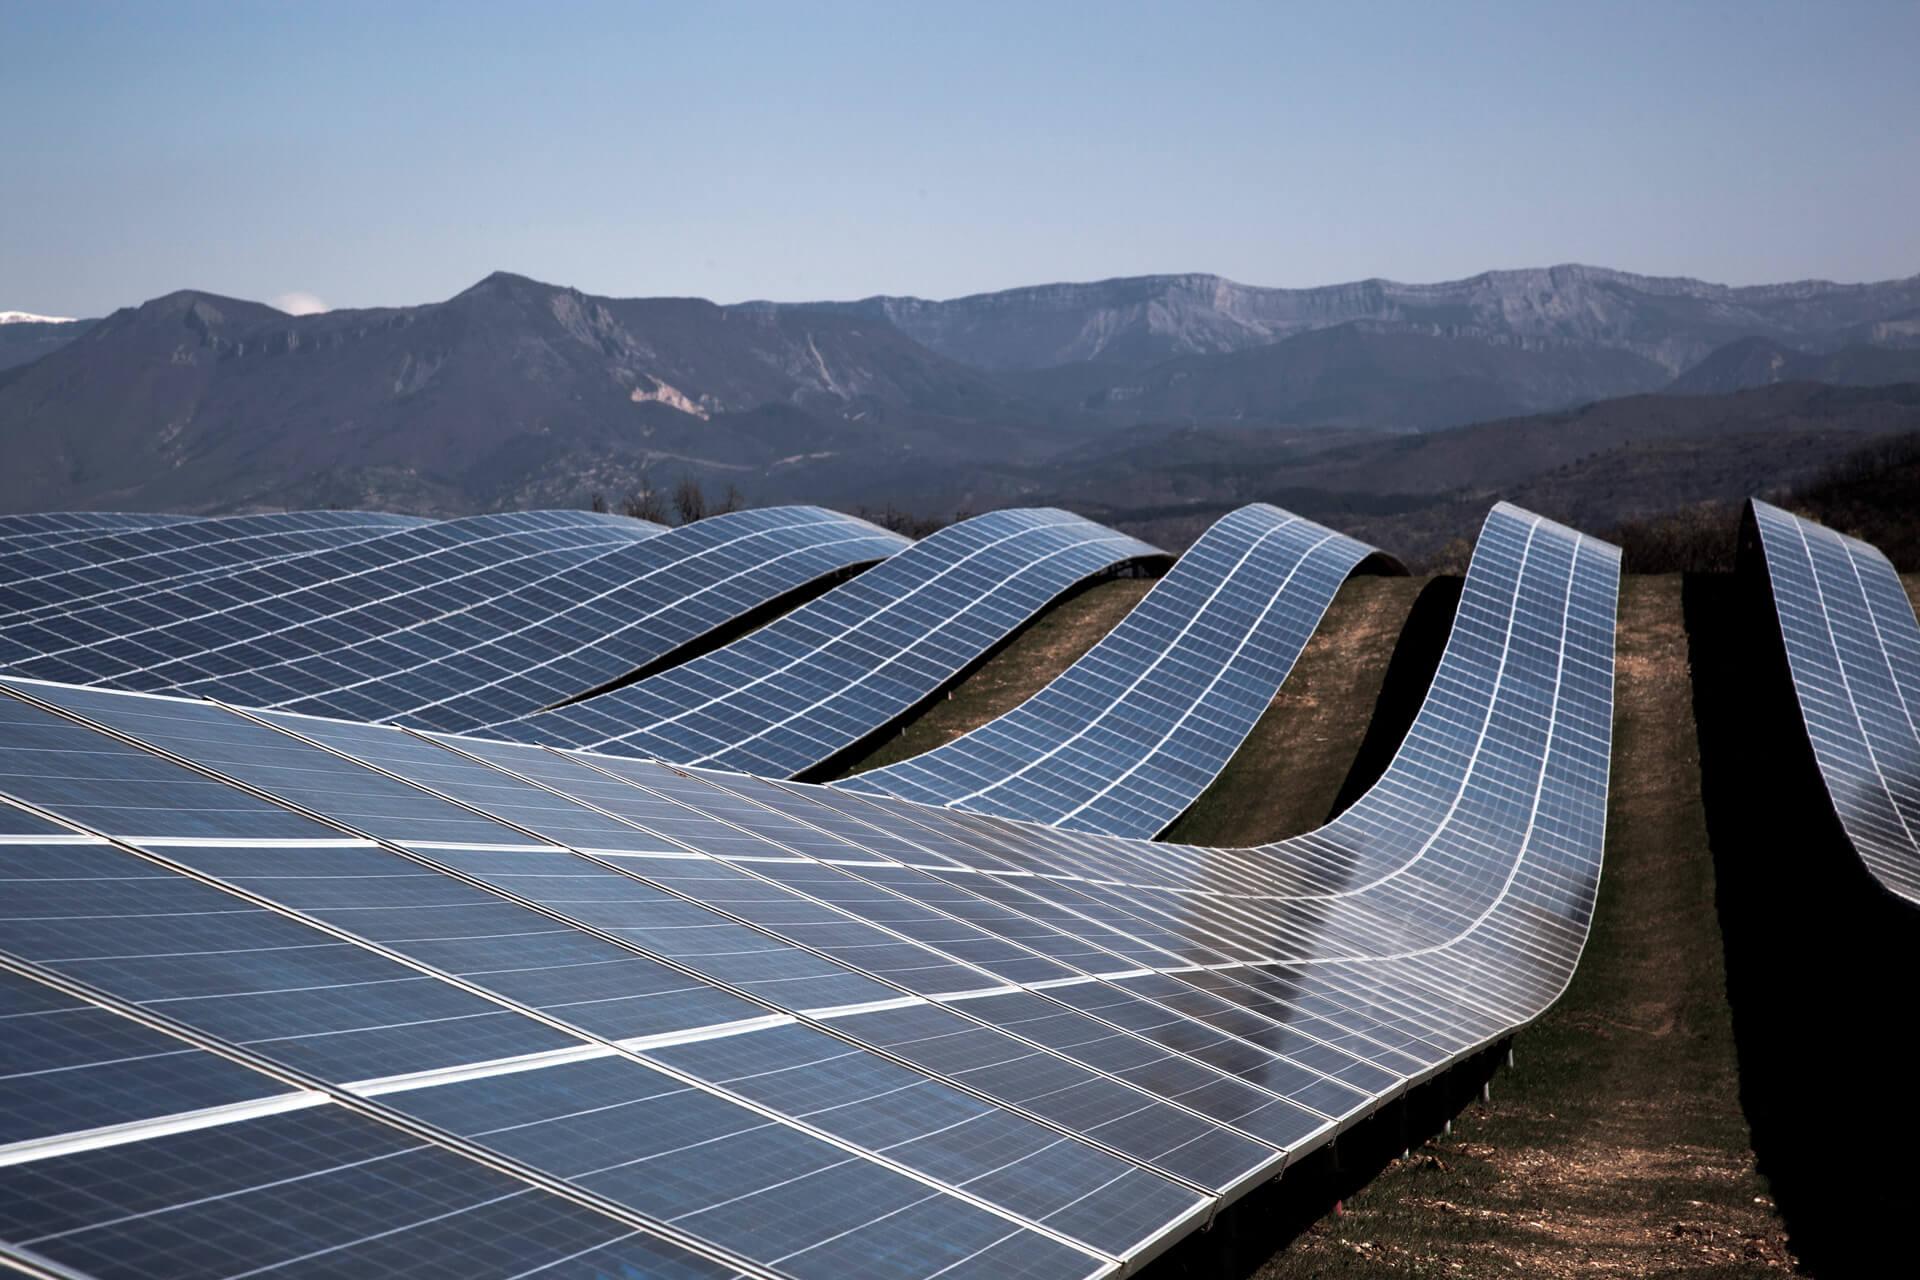 Napelem és a napenergia érvek